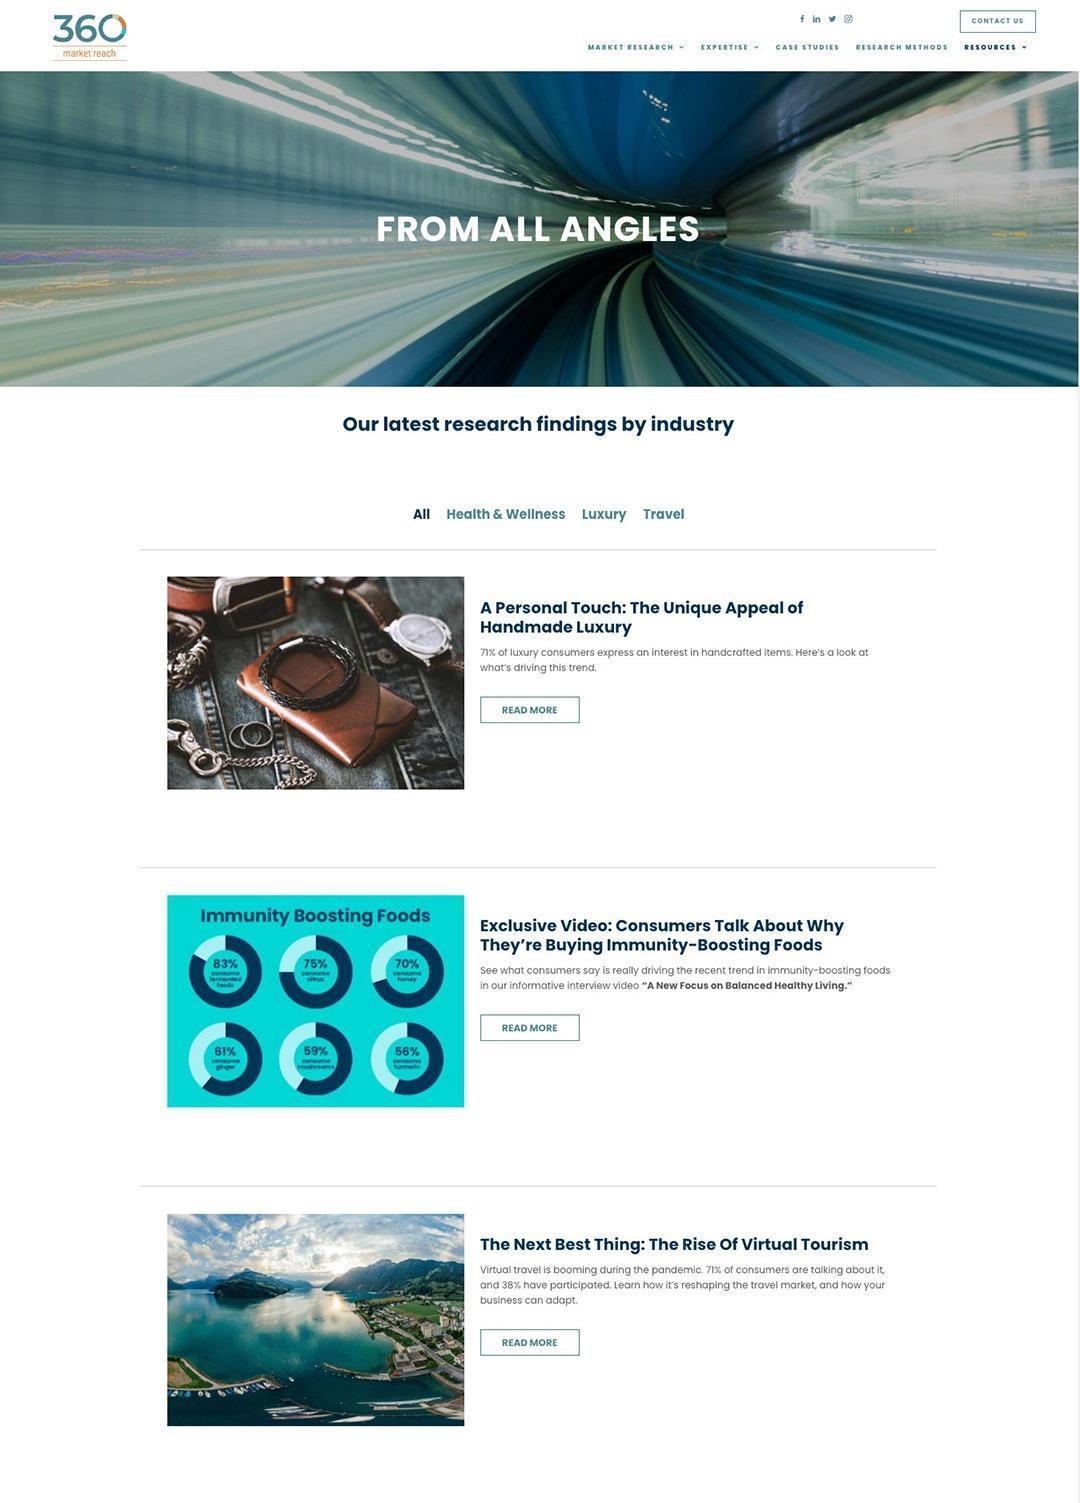 360-market-reach-website-research-updates